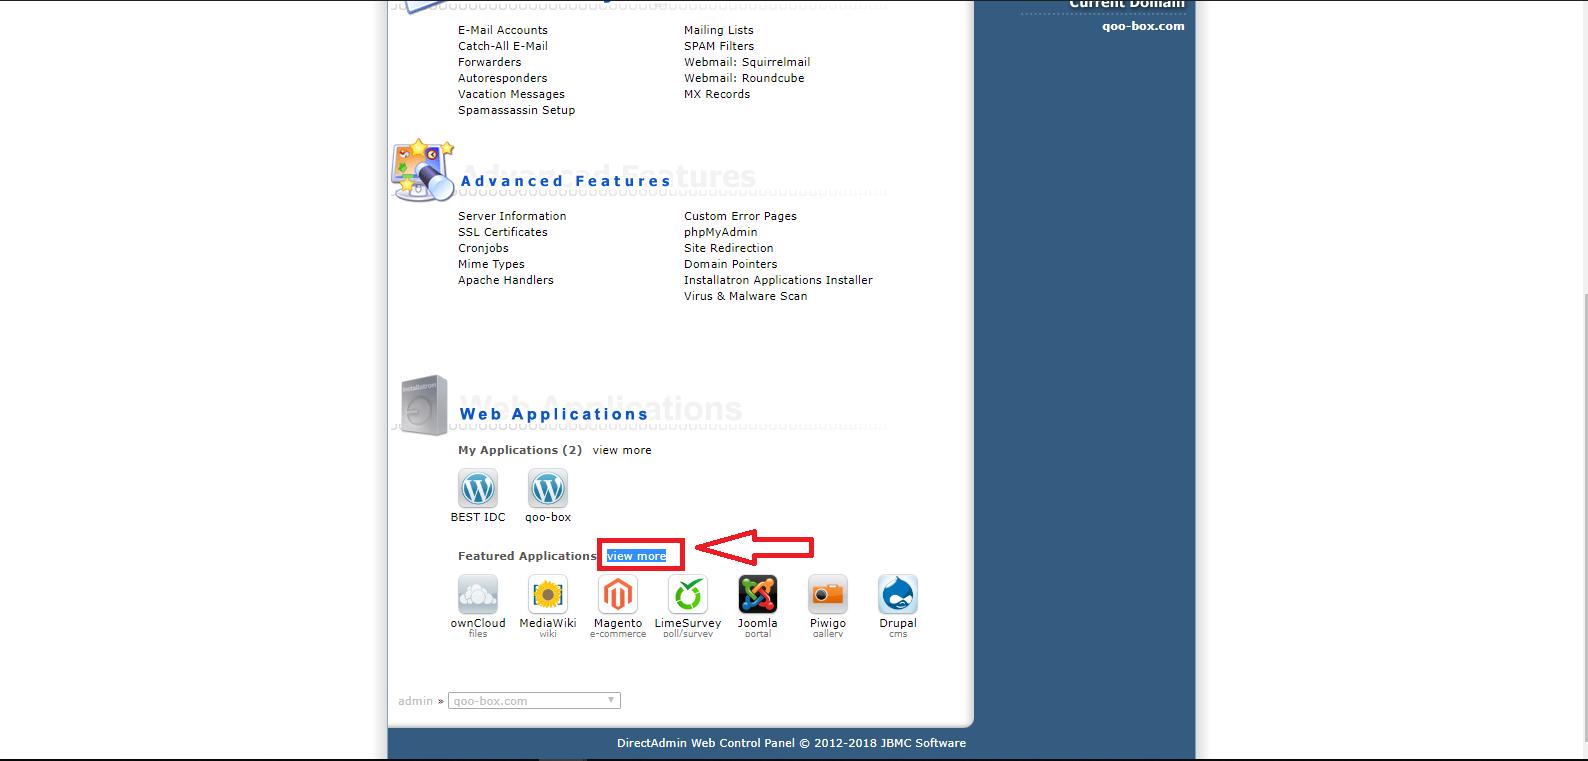 installatron - install wordpress - วิธีติดตั้ง wordpress